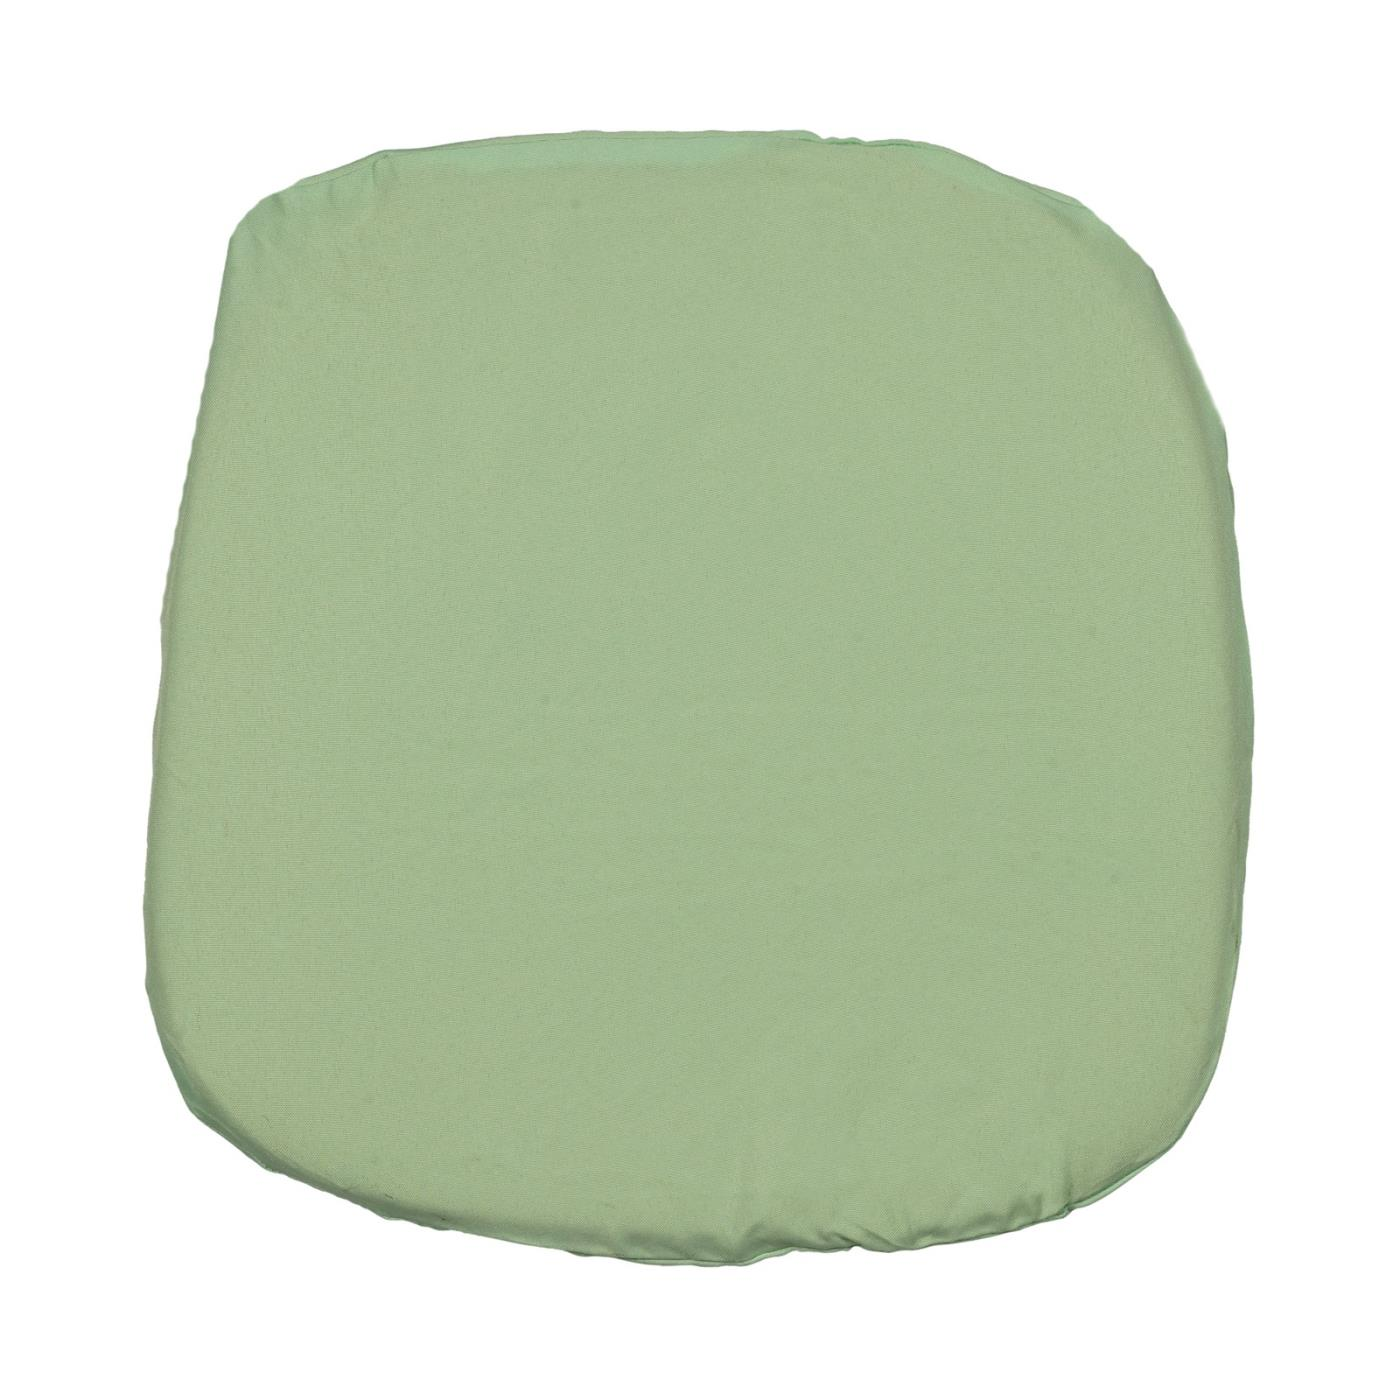 Poly Seat Cushion - Mint